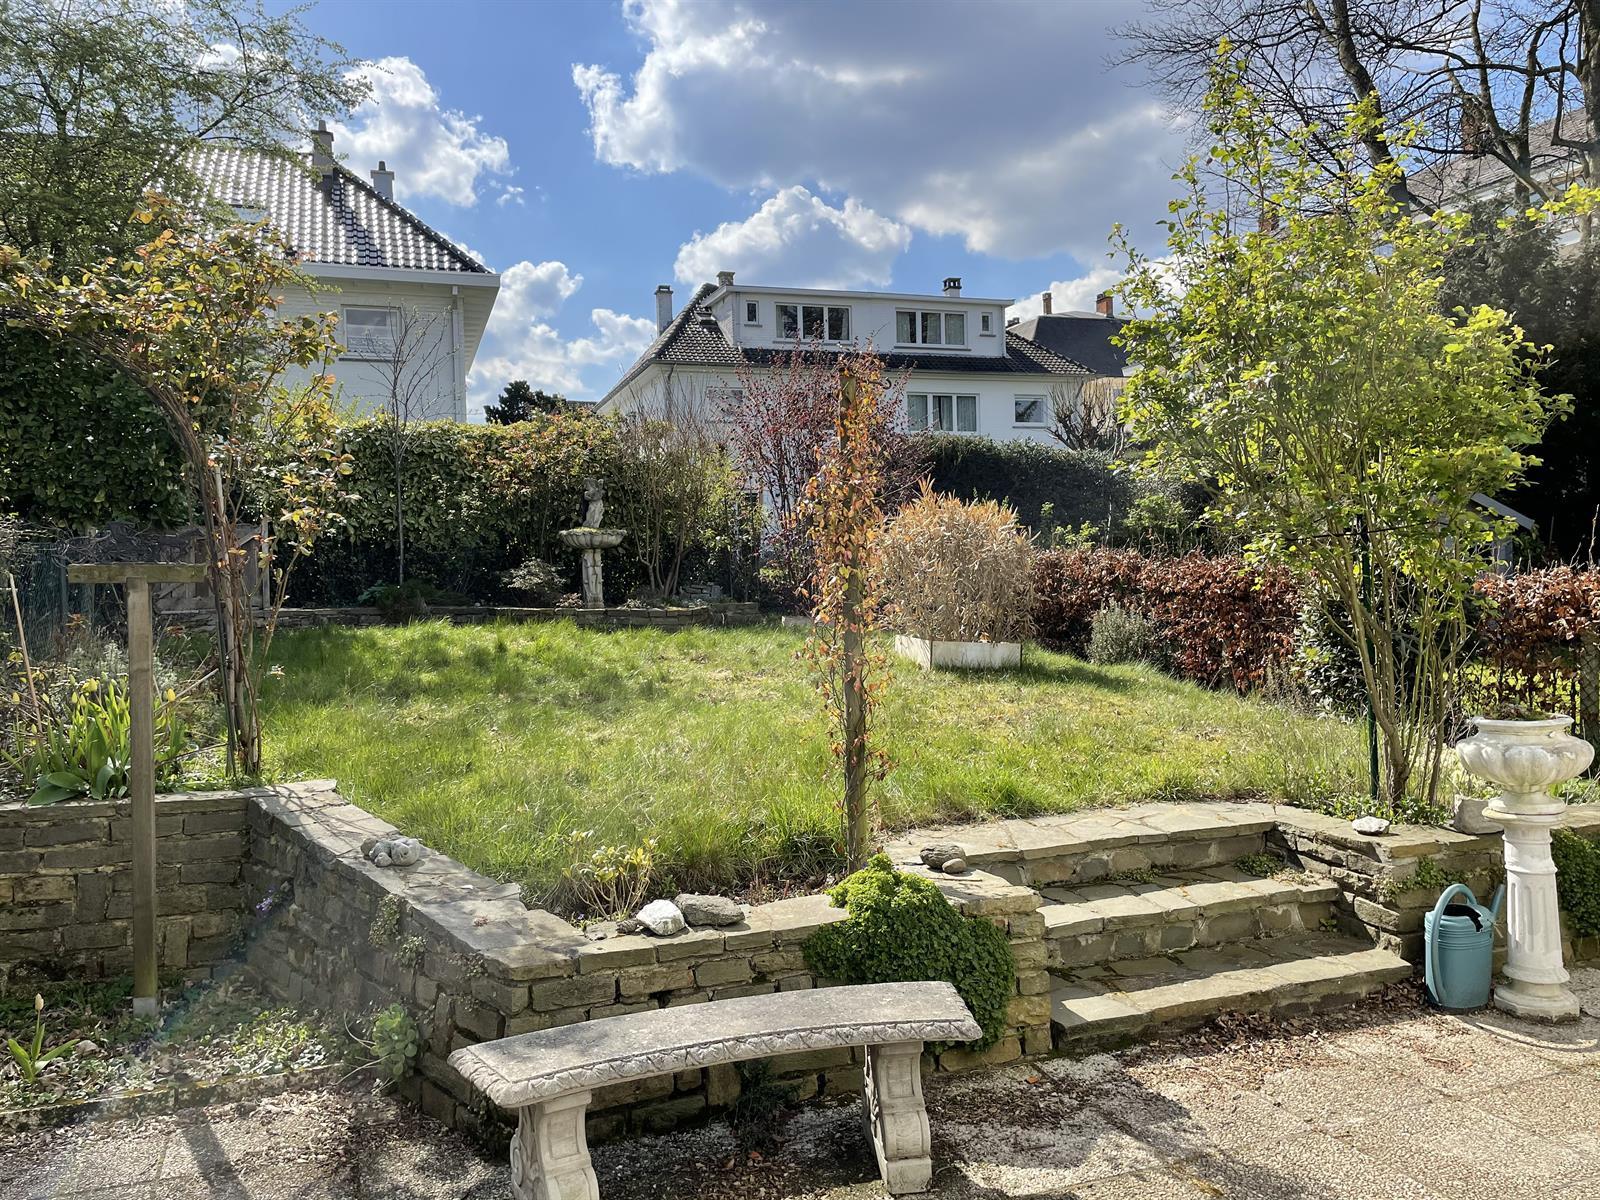 Semi-detached house - Woluwe-Saint-Pierre - #4372187-1